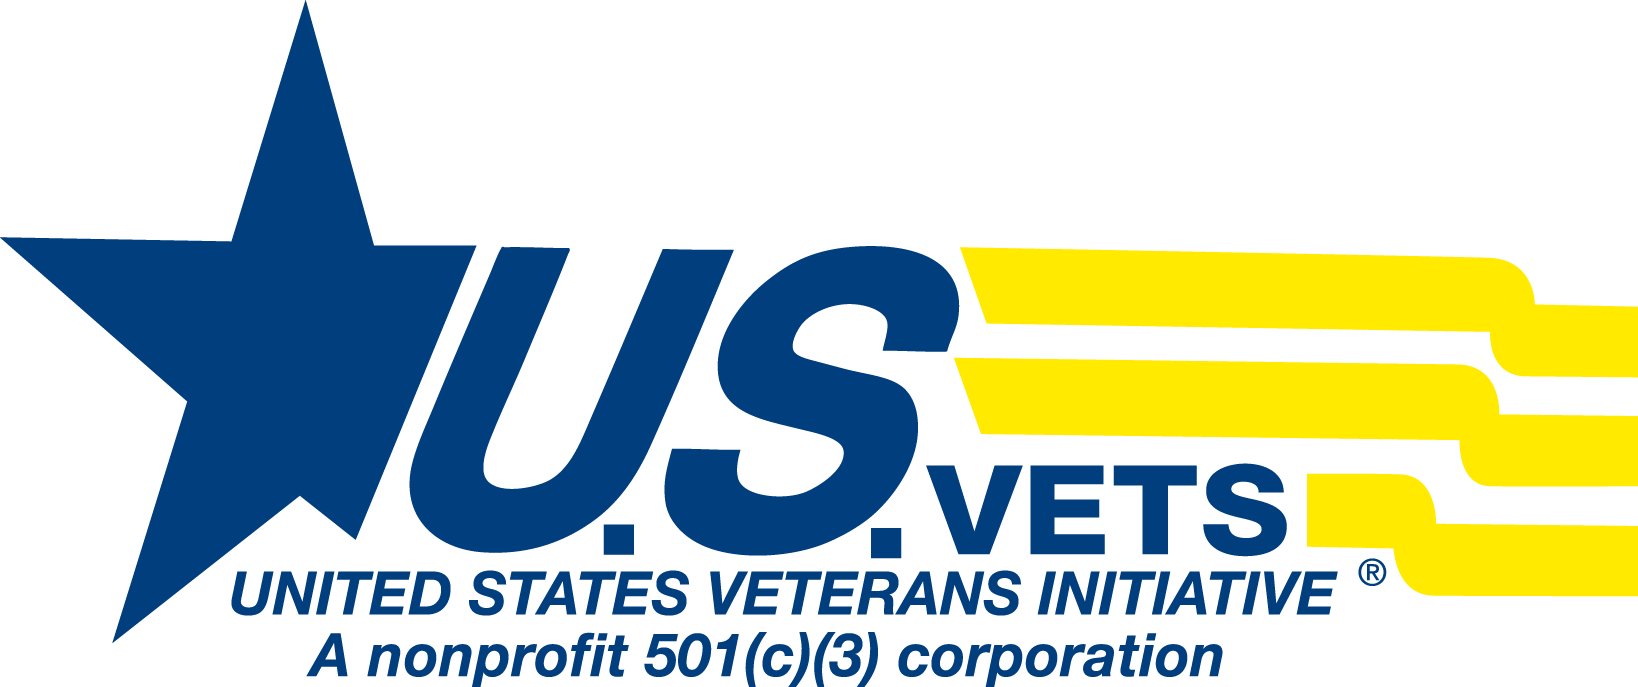 2013-USVETS-logo.png